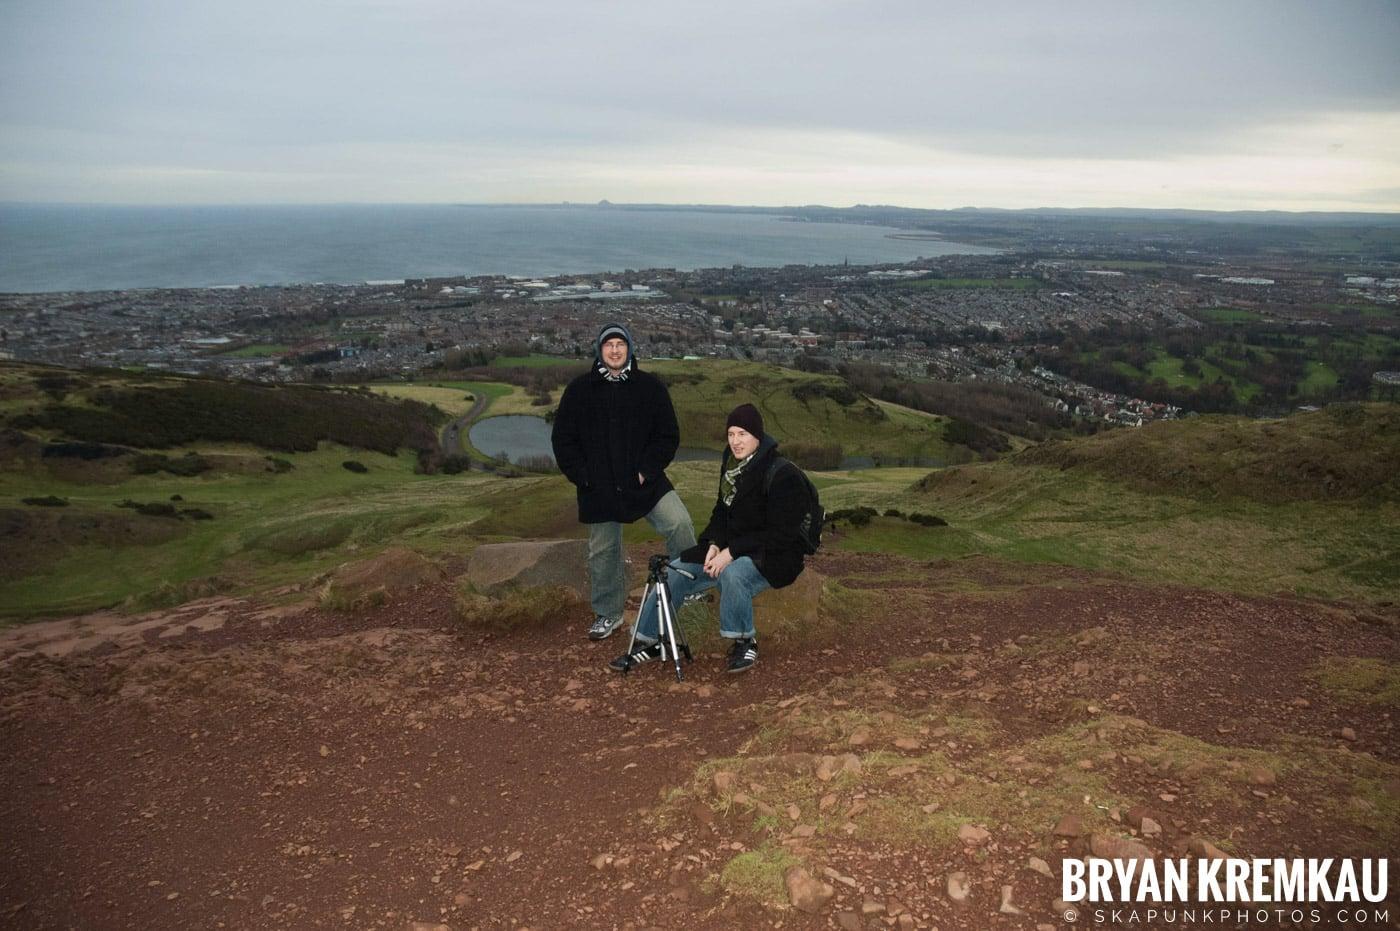 Edinburgh, Scotland - Day 3 - 12.14.06 (10)